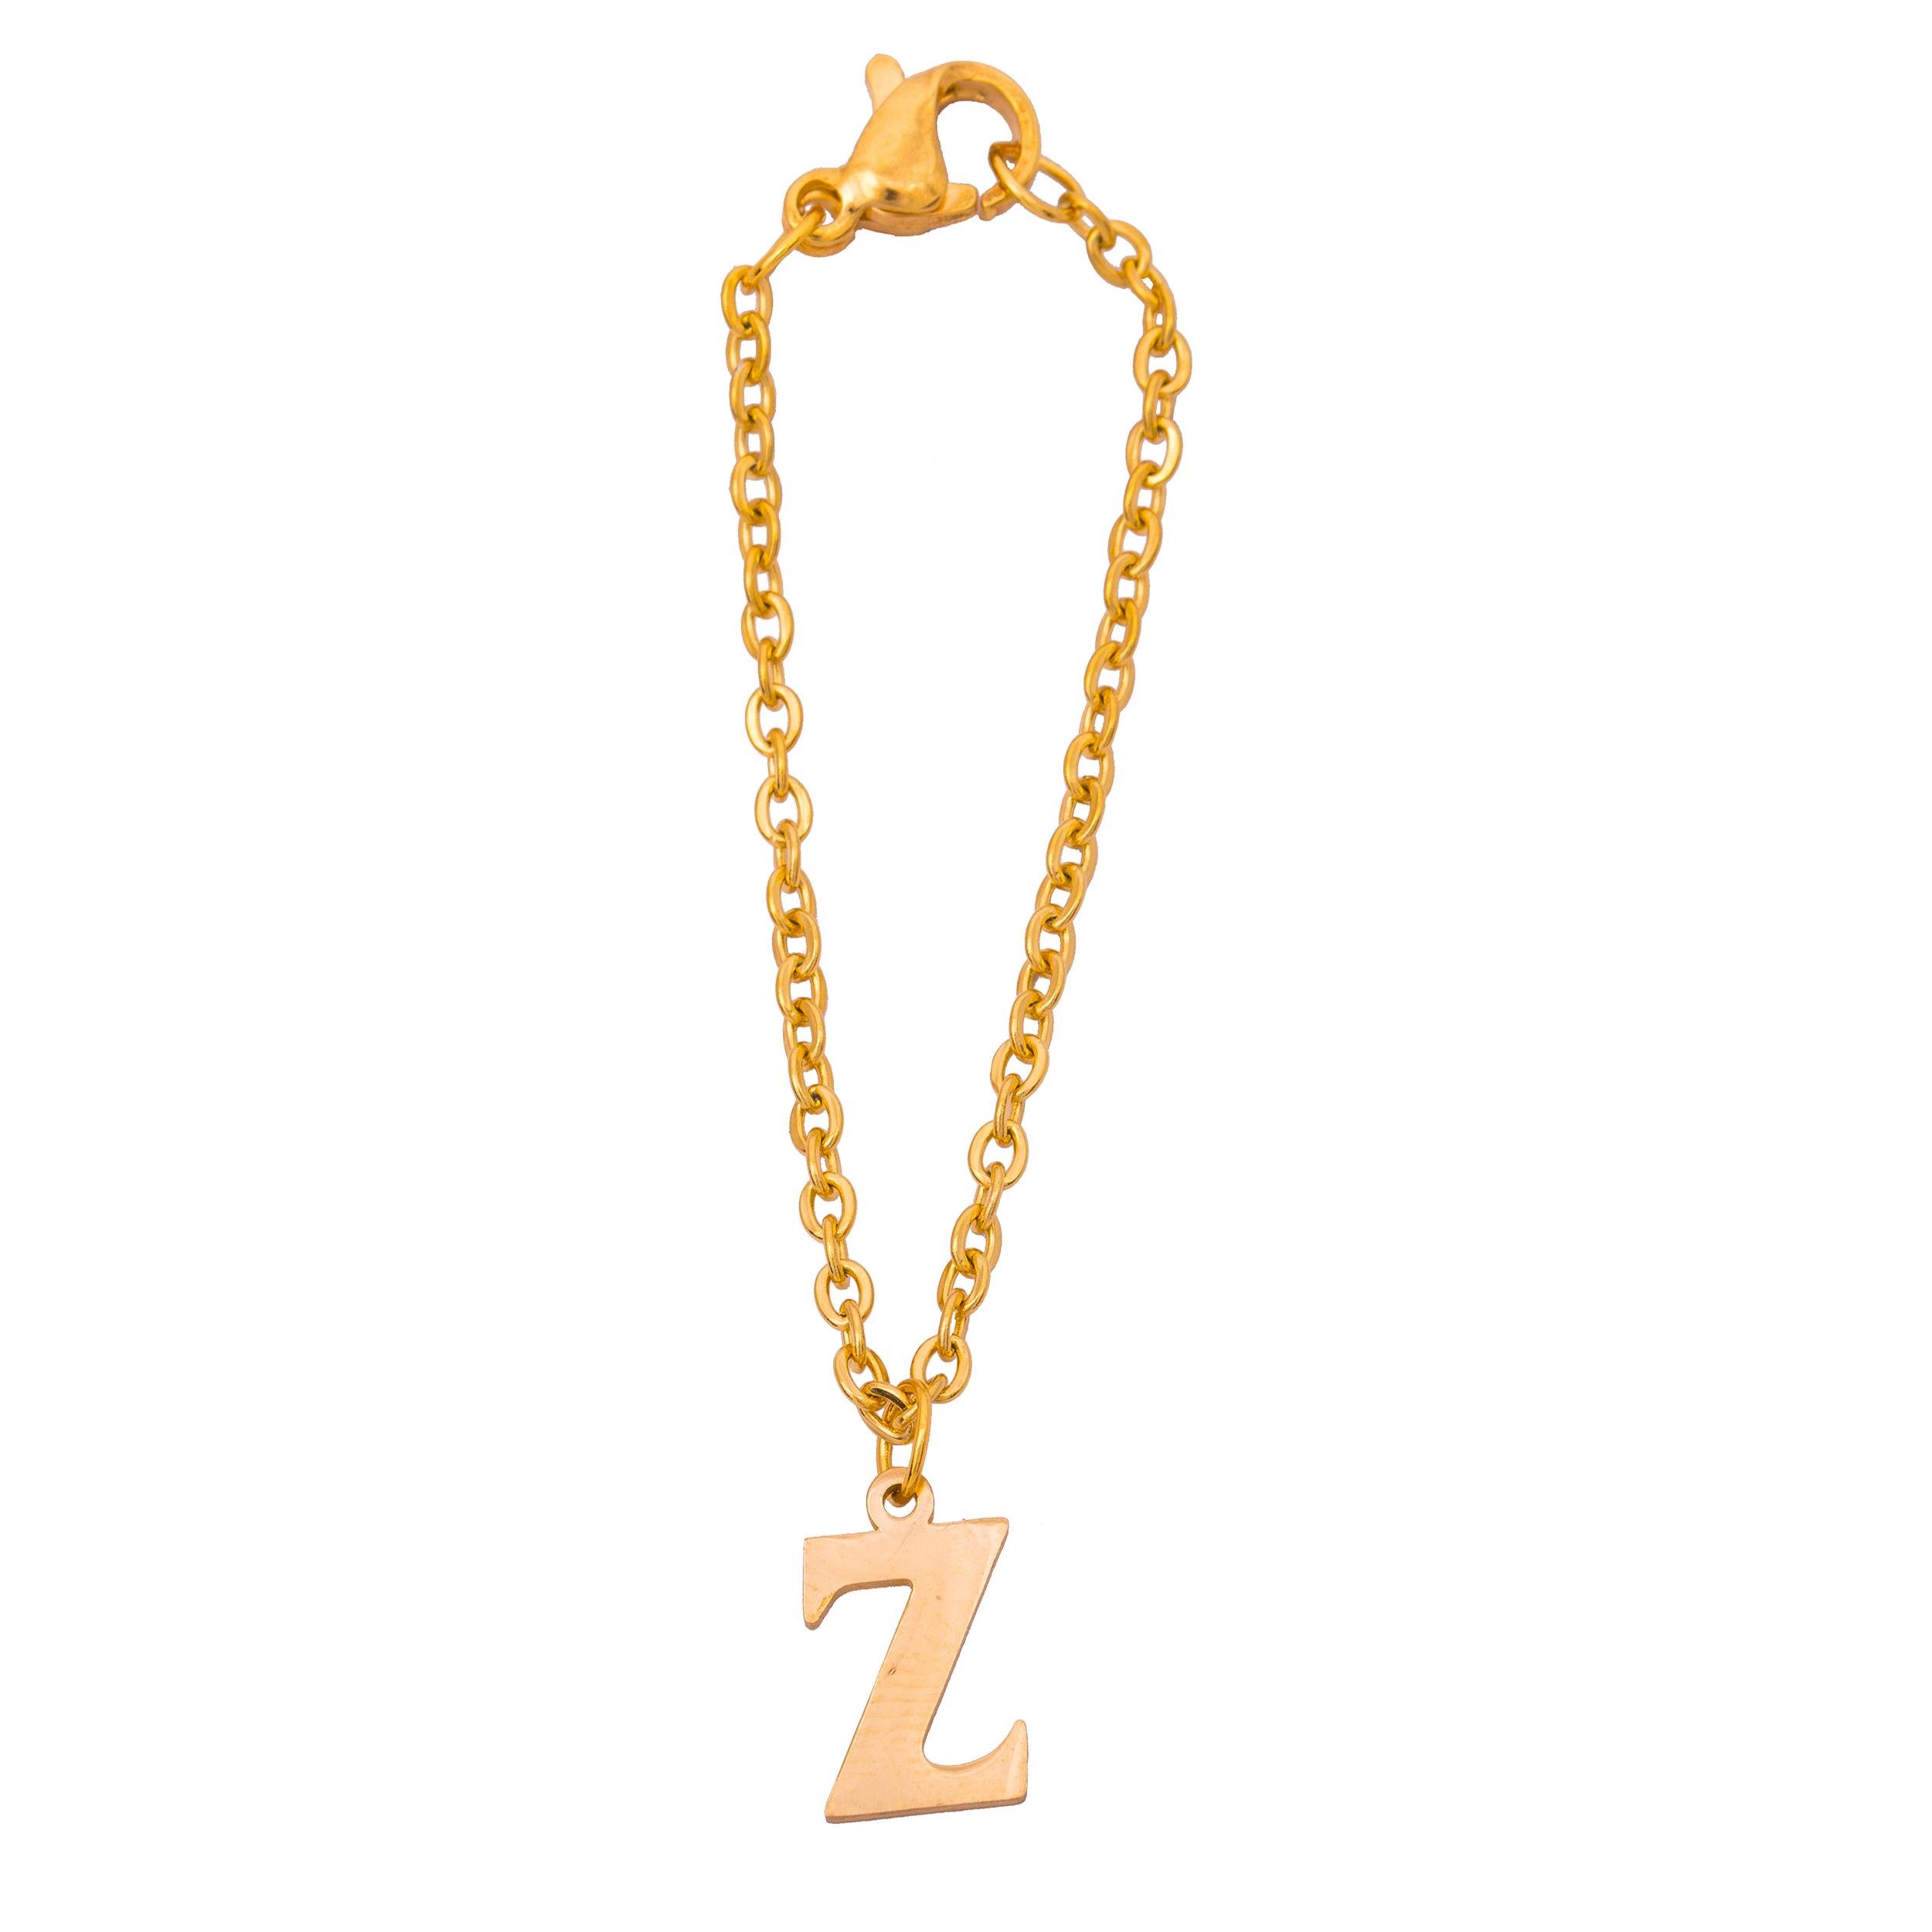 خرید آویز ساعت زنانه حرف Z کد AS1002